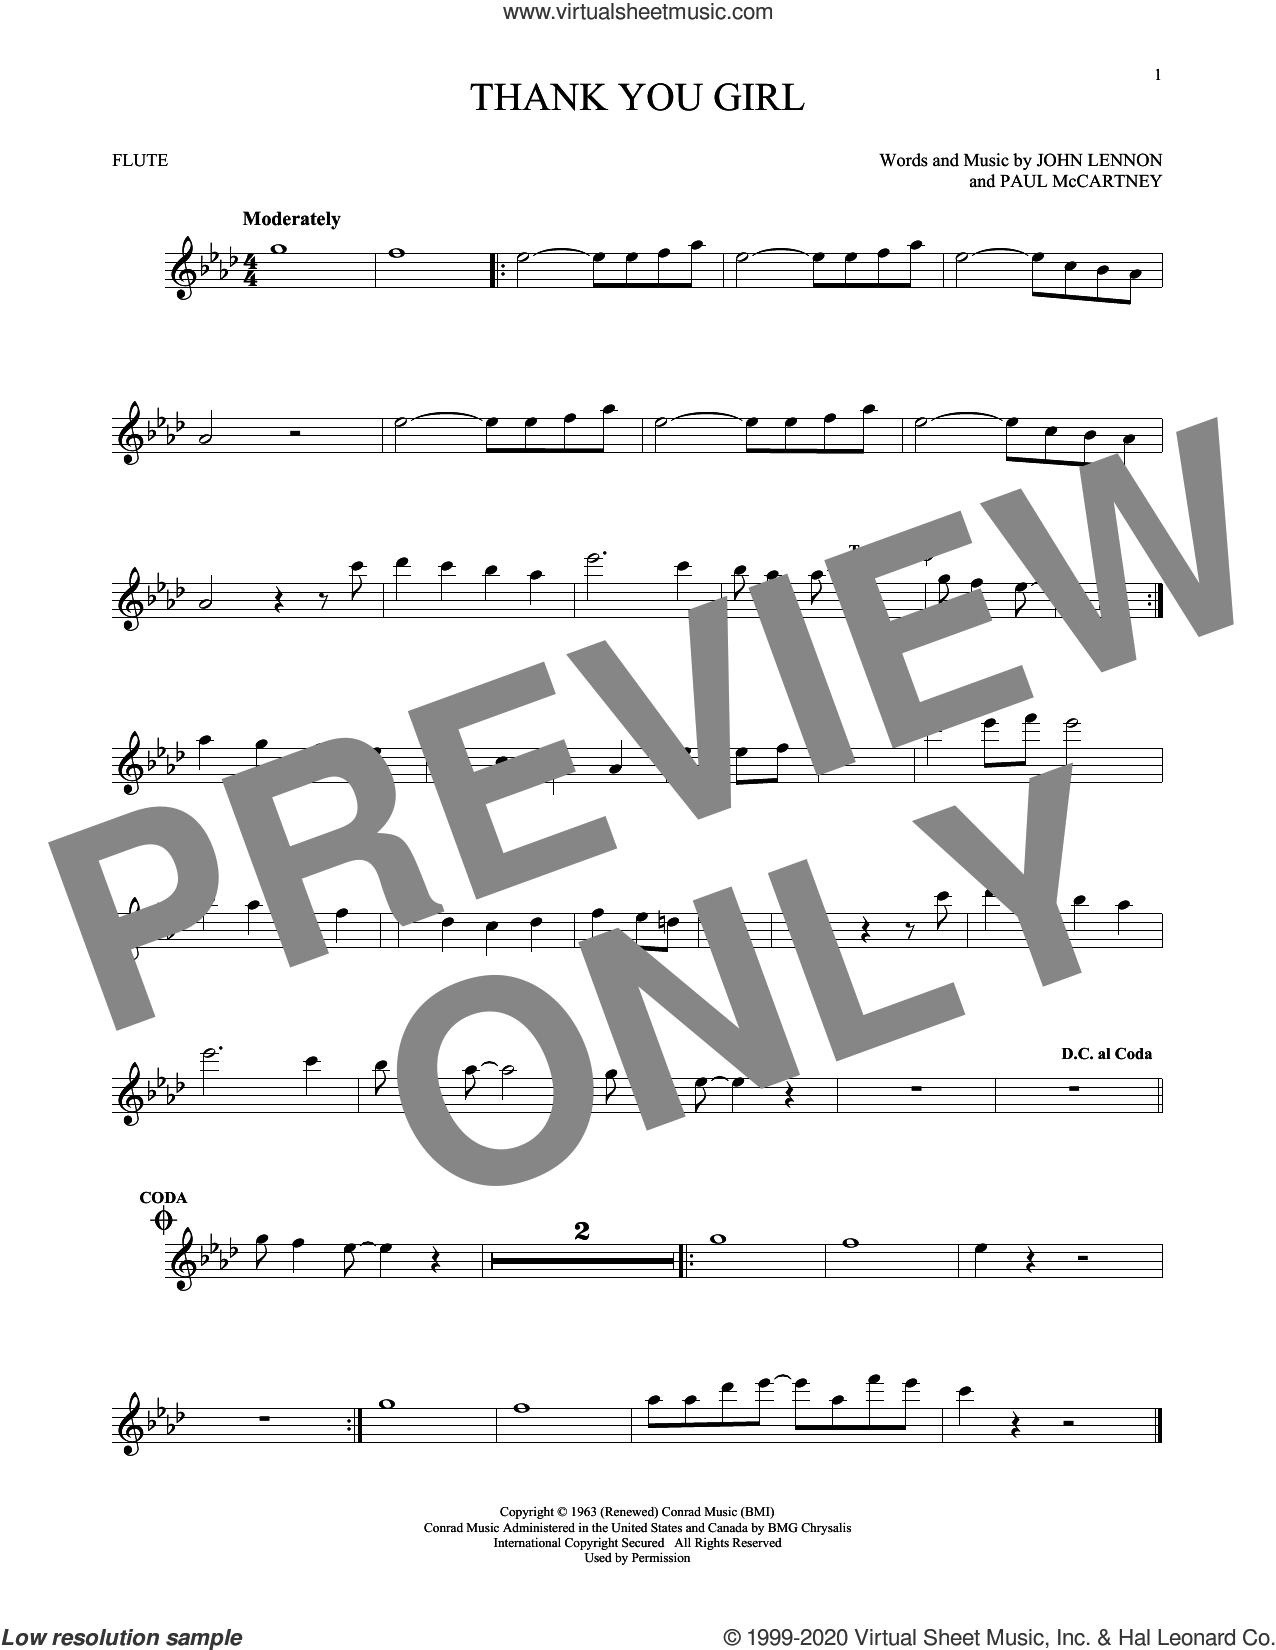 Thank You Girl sheet music for flute solo by The Beatles, John Lennon and Paul McCartney, intermediate skill level